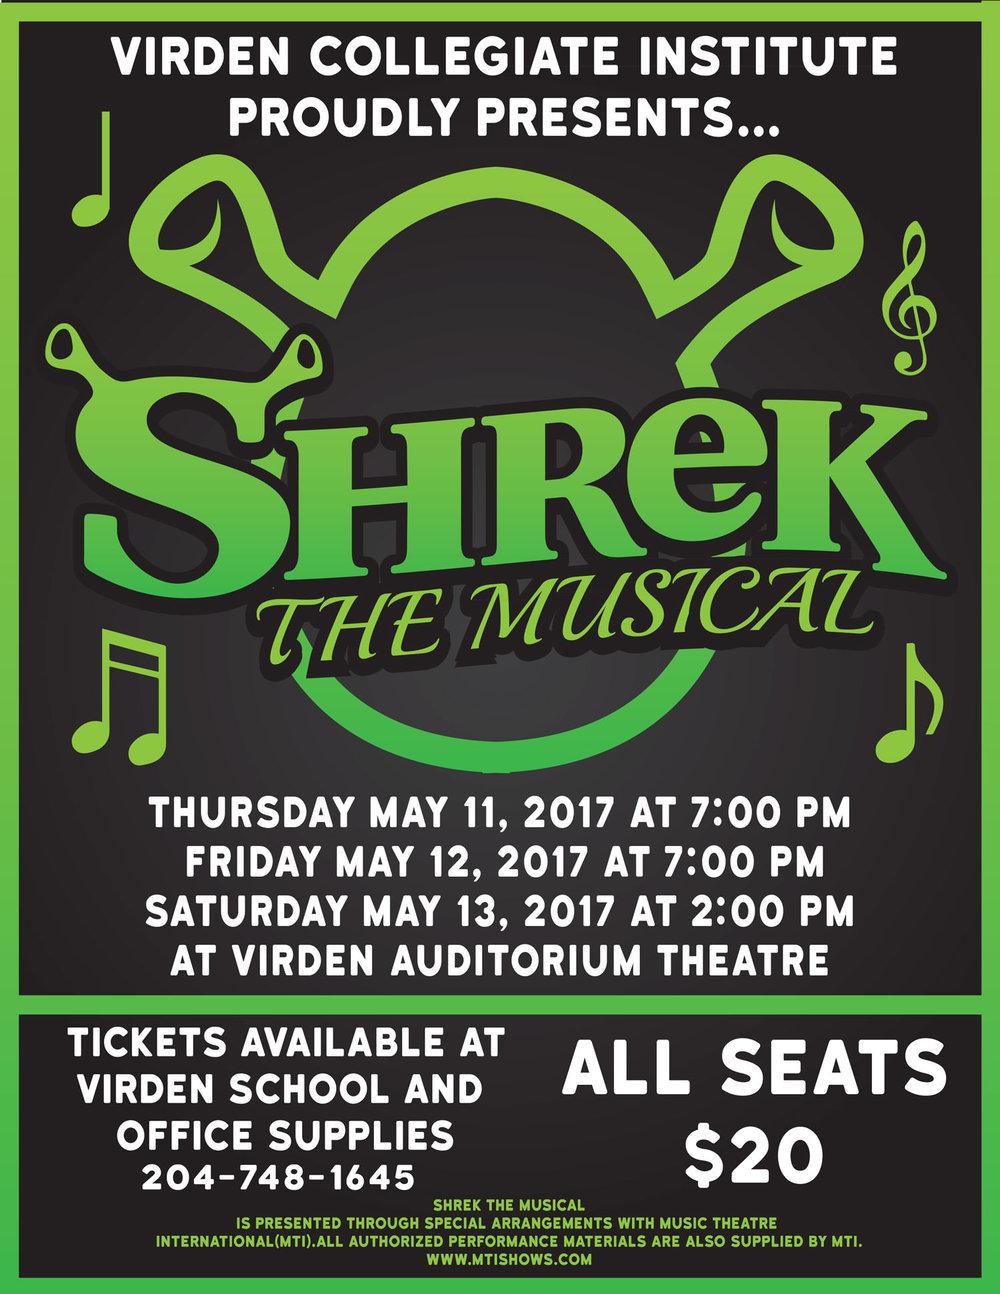 Virden Collegiate Institute: Shrek the Musical